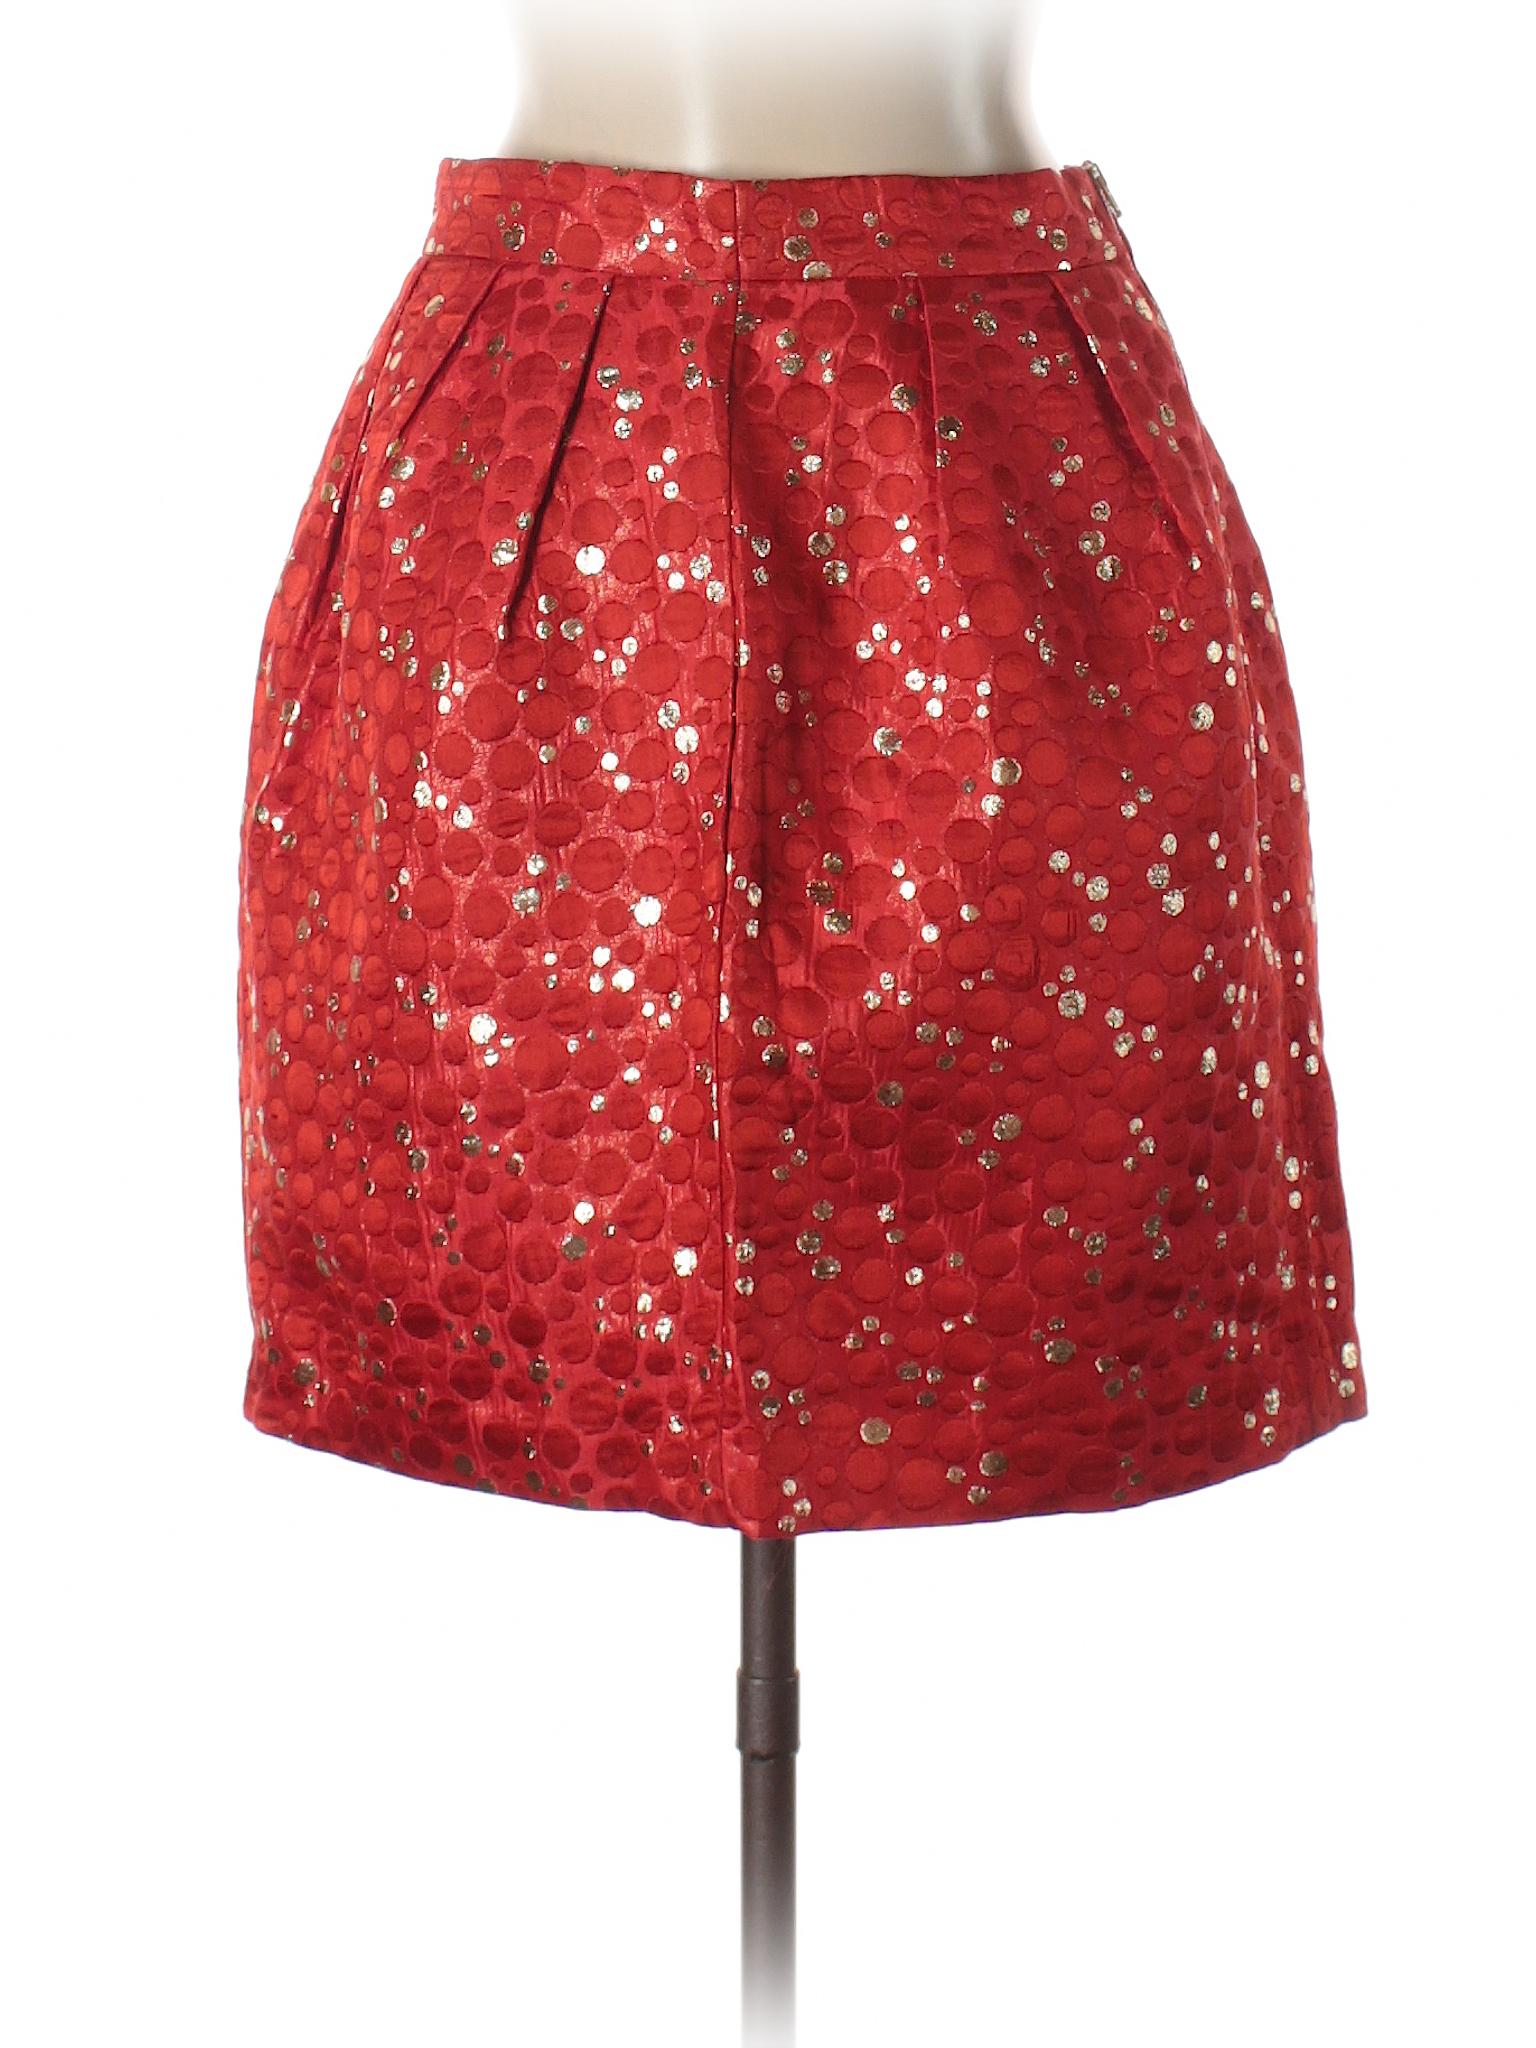 Formal Leisure Lauren Moffatt winter Skirt Wzz80